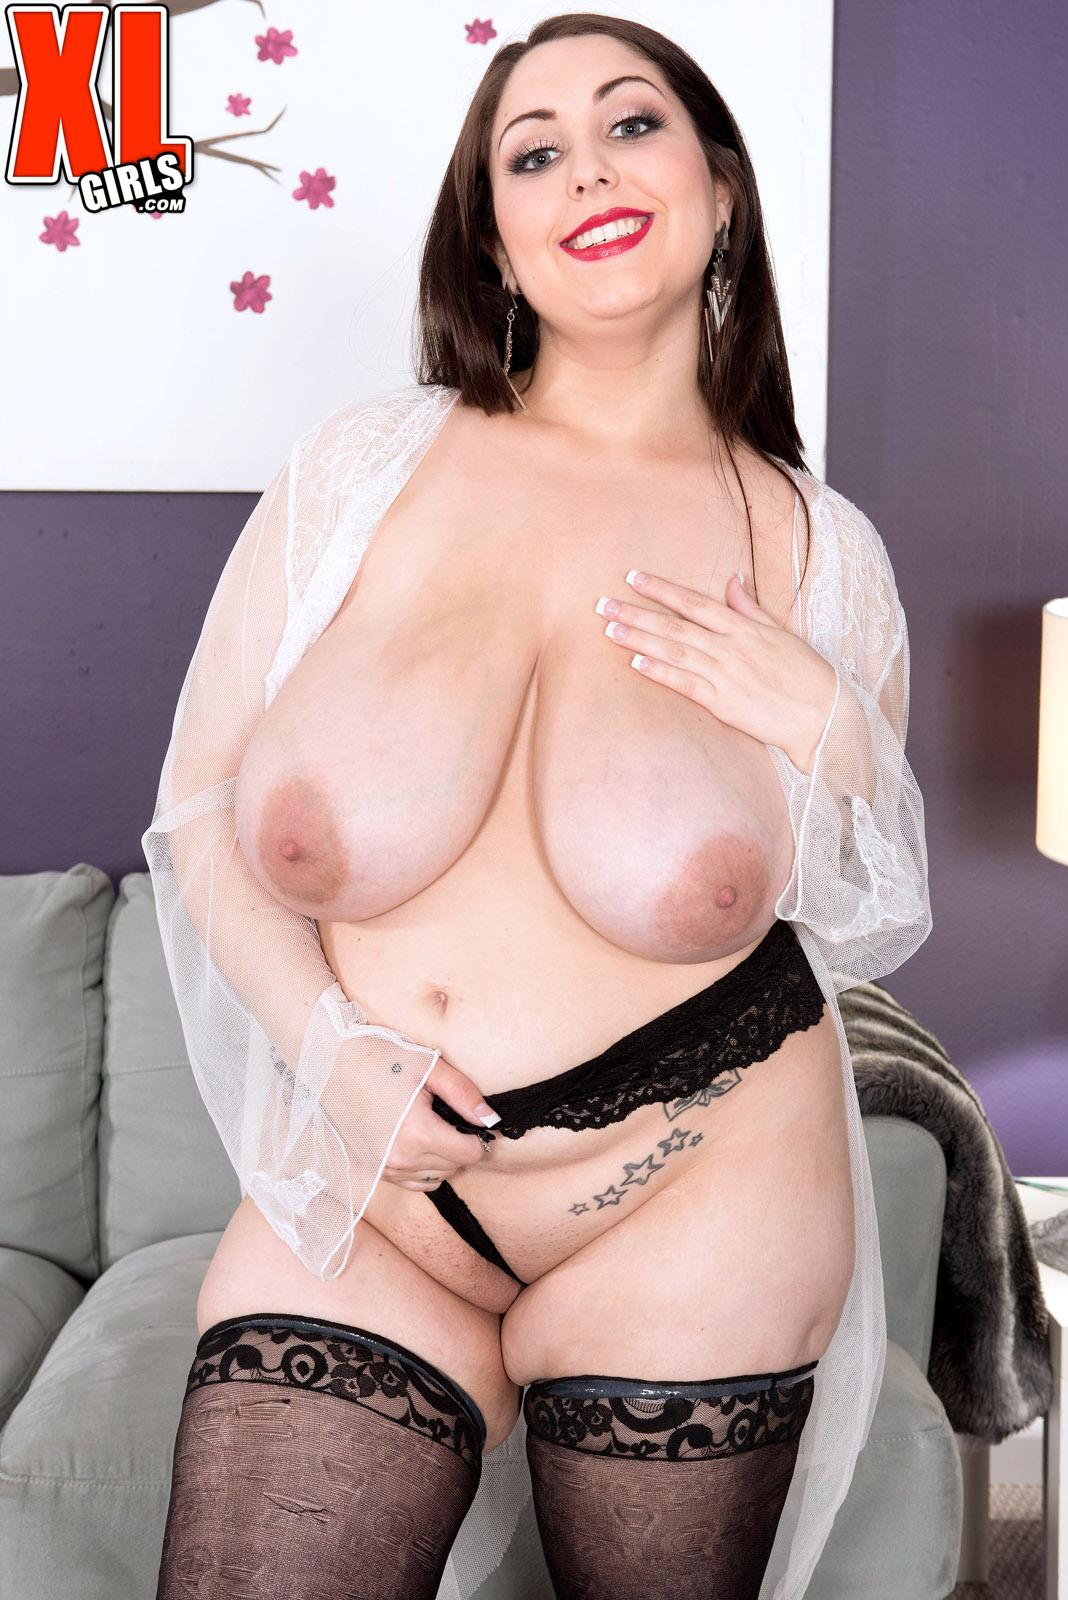 Chubby beauty alexxxis allure hardcore sex 3